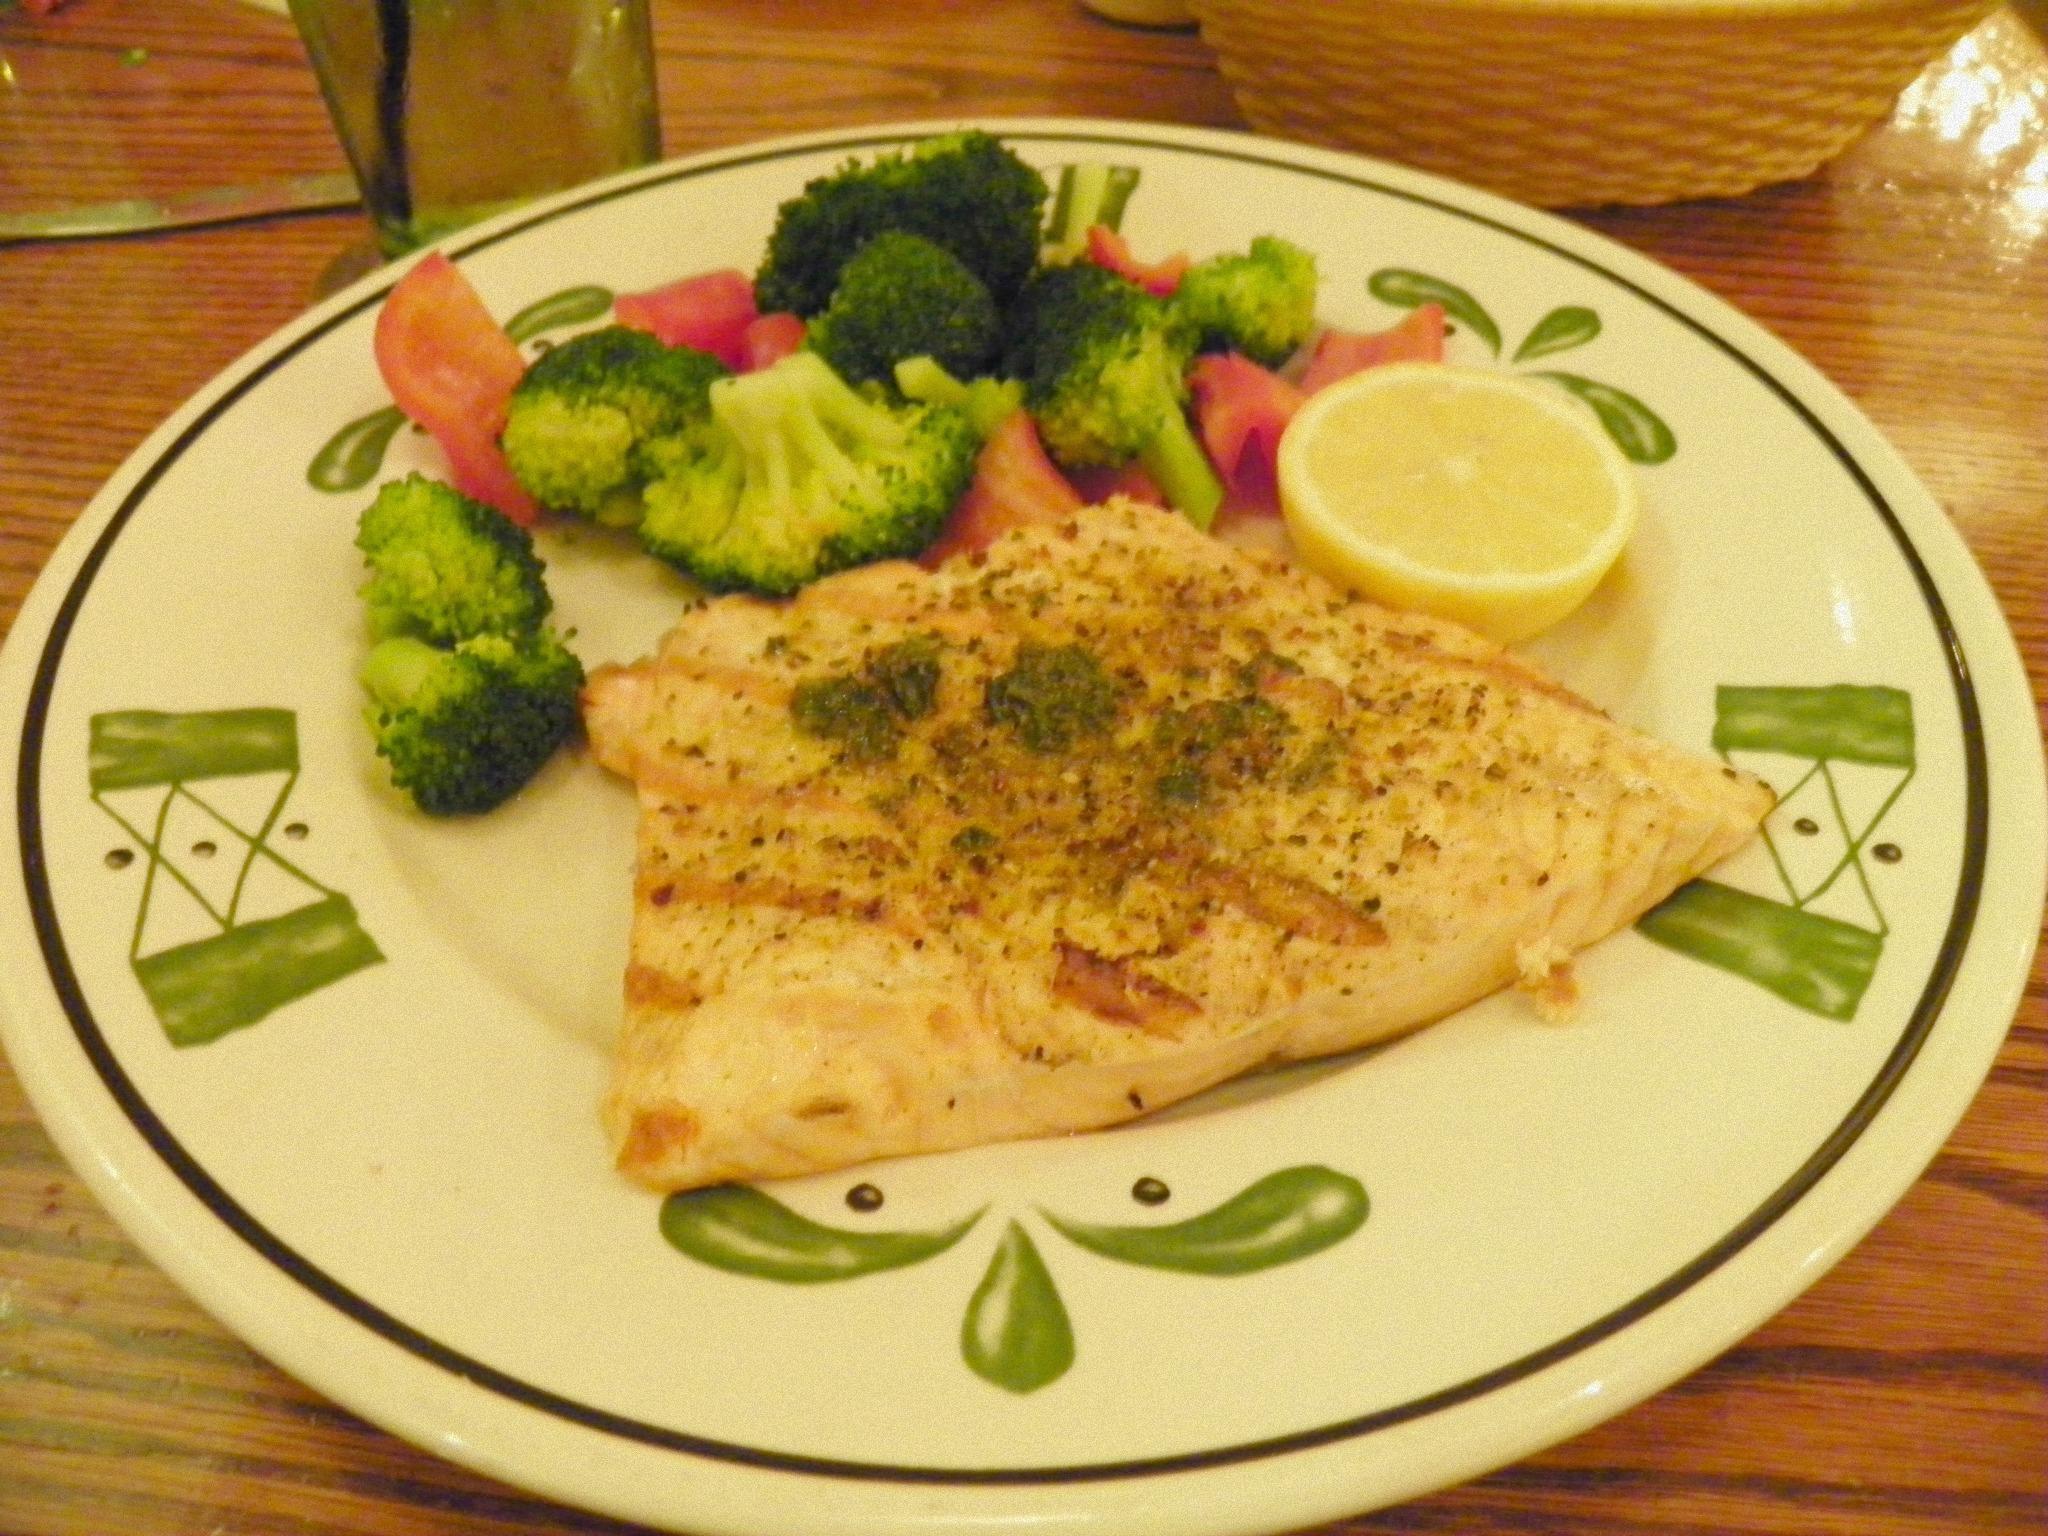 Menu For Olive Garden: Olive Garden's New Lighter Fare Menu (Review